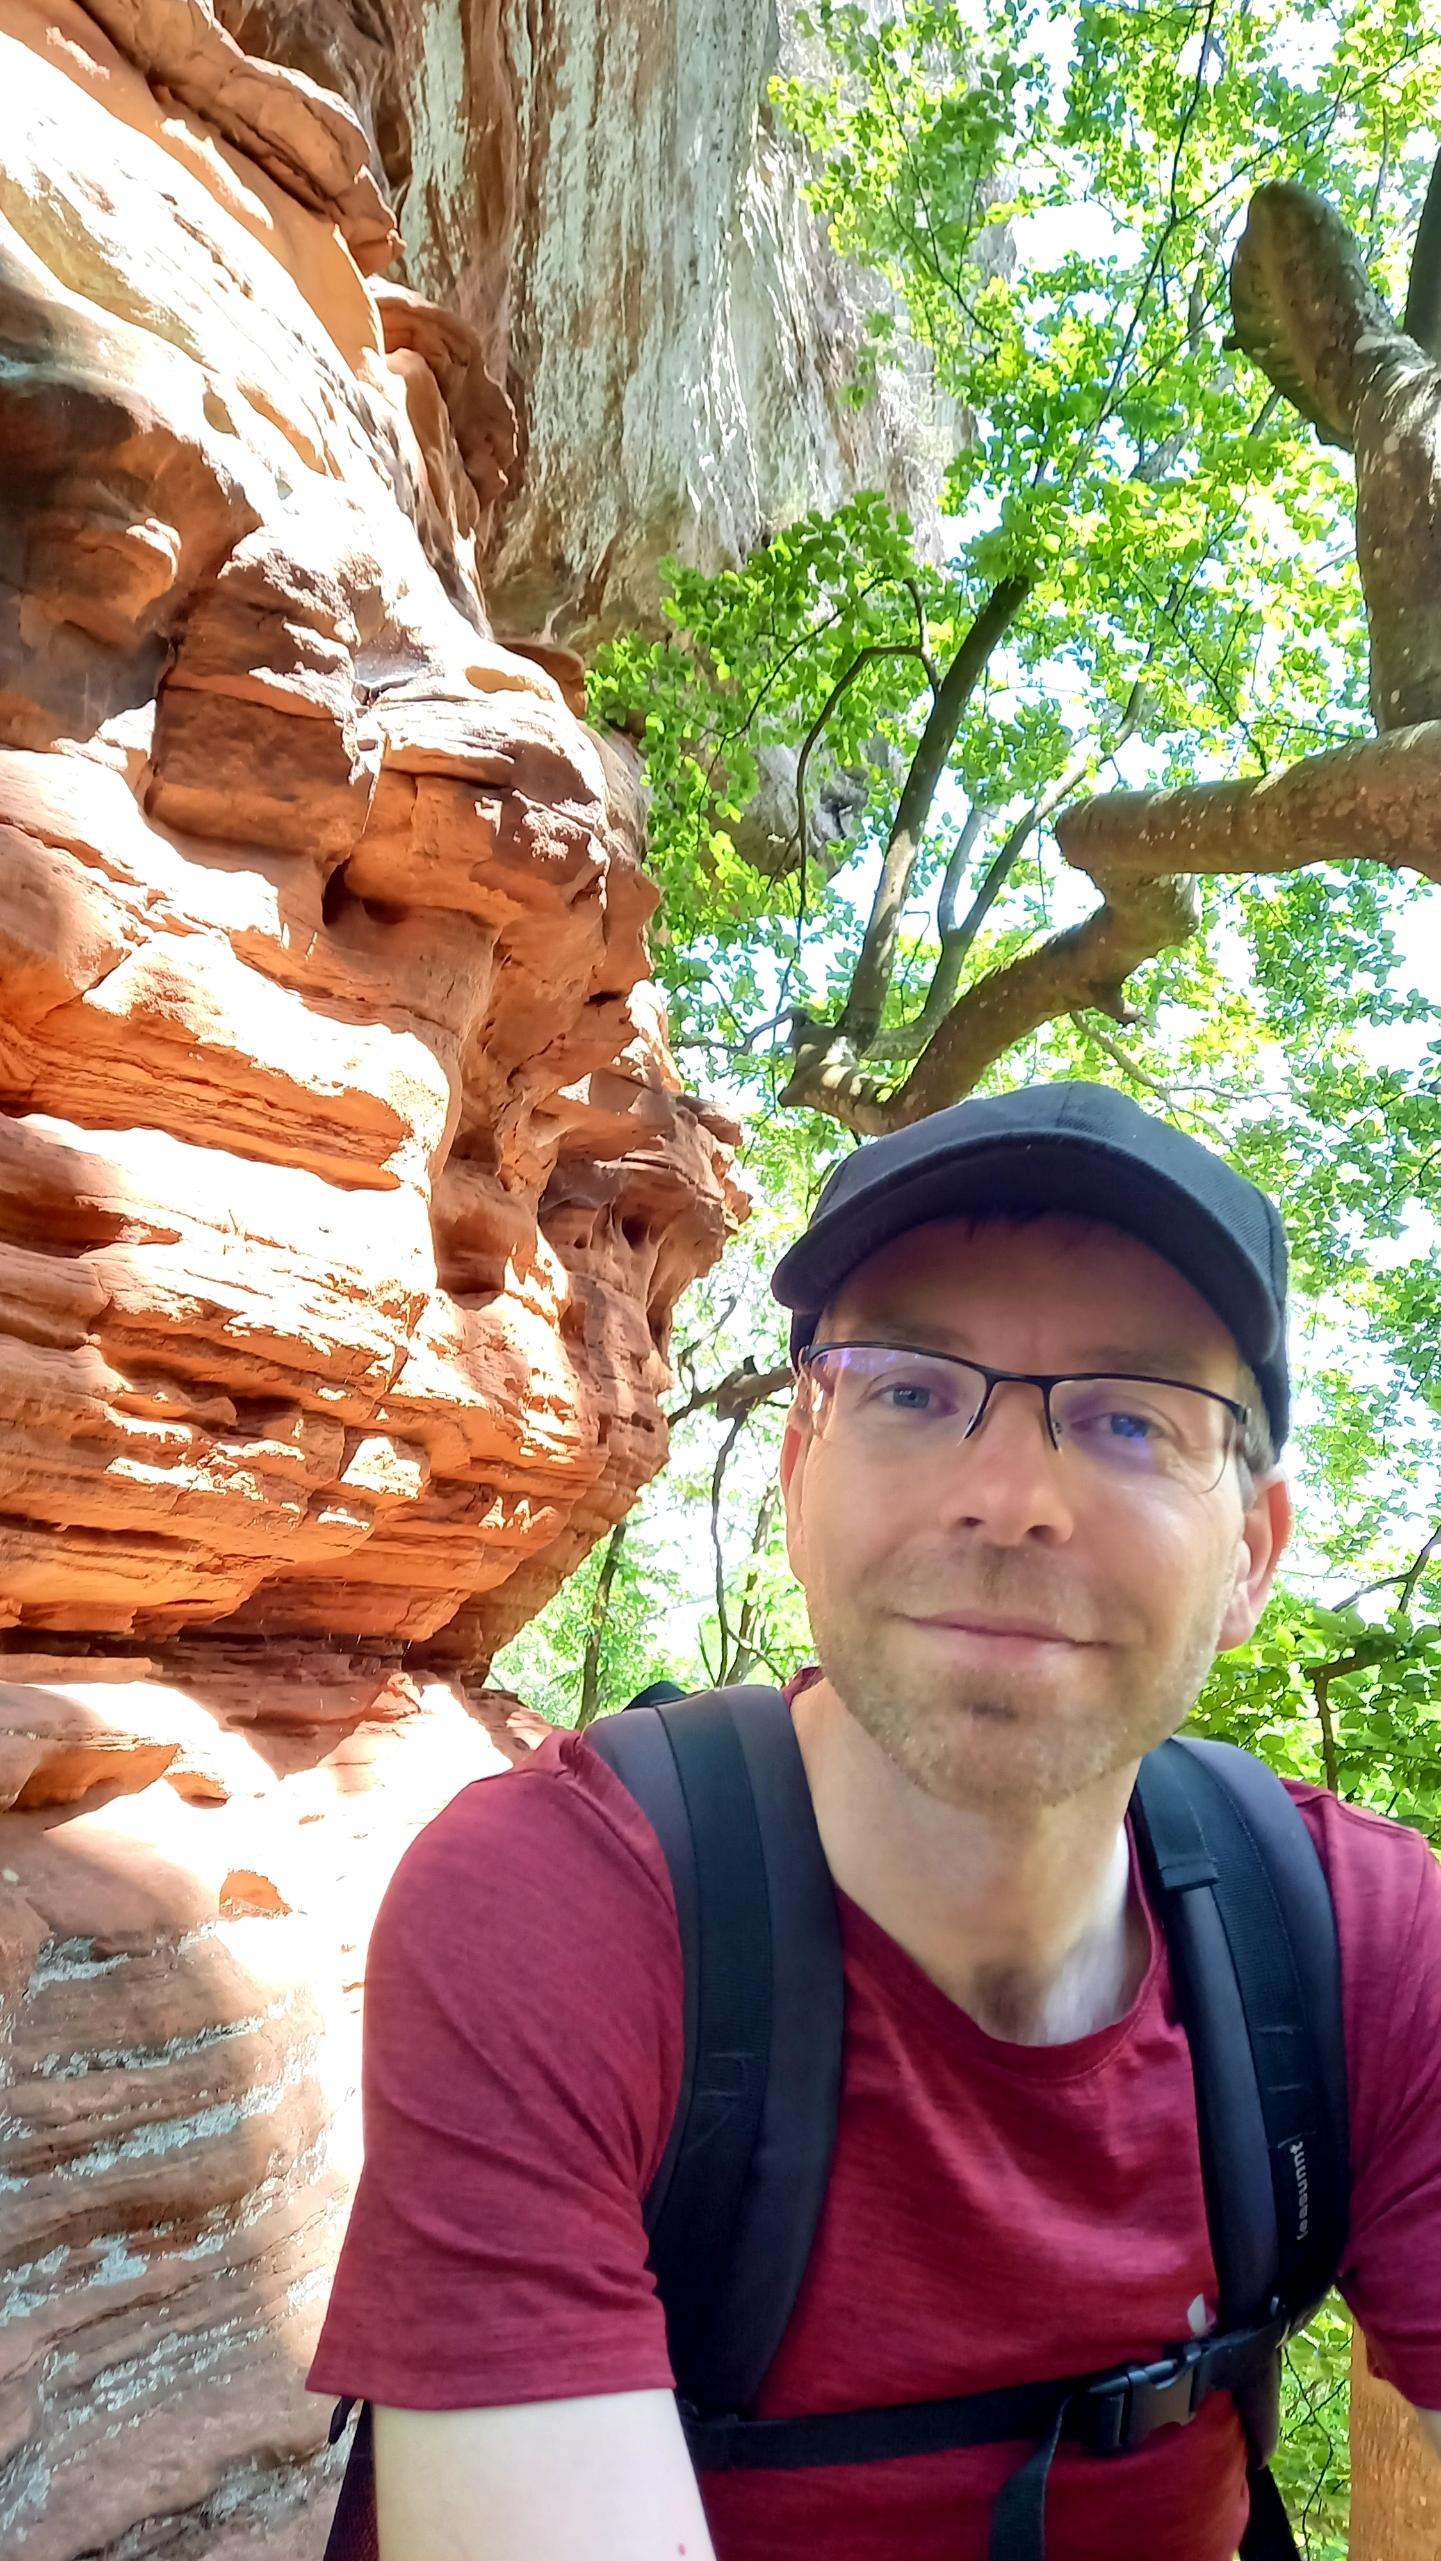 Avatar of Mathieu Schneider